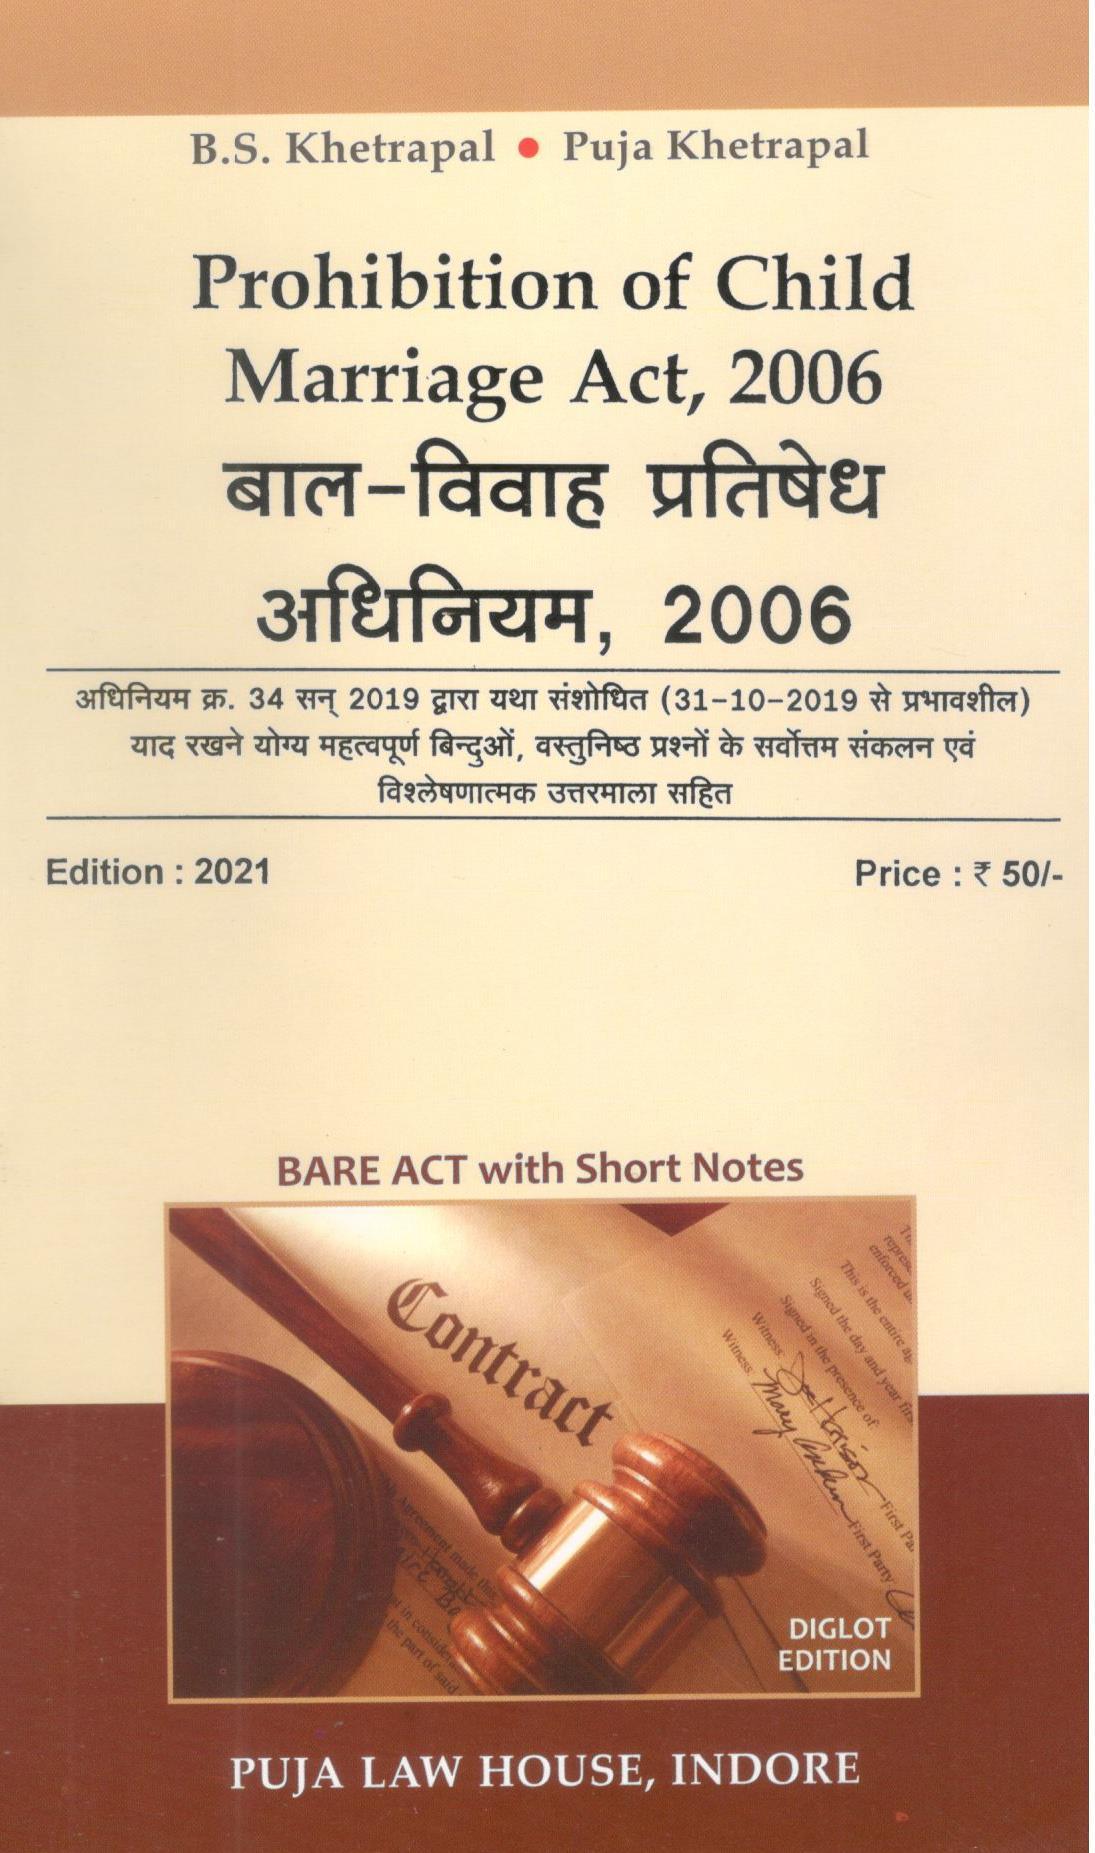 Prohibition of Child Marrige Act, 2006 / बाल विवाह प्रतिषेध अधिनियम, 2006